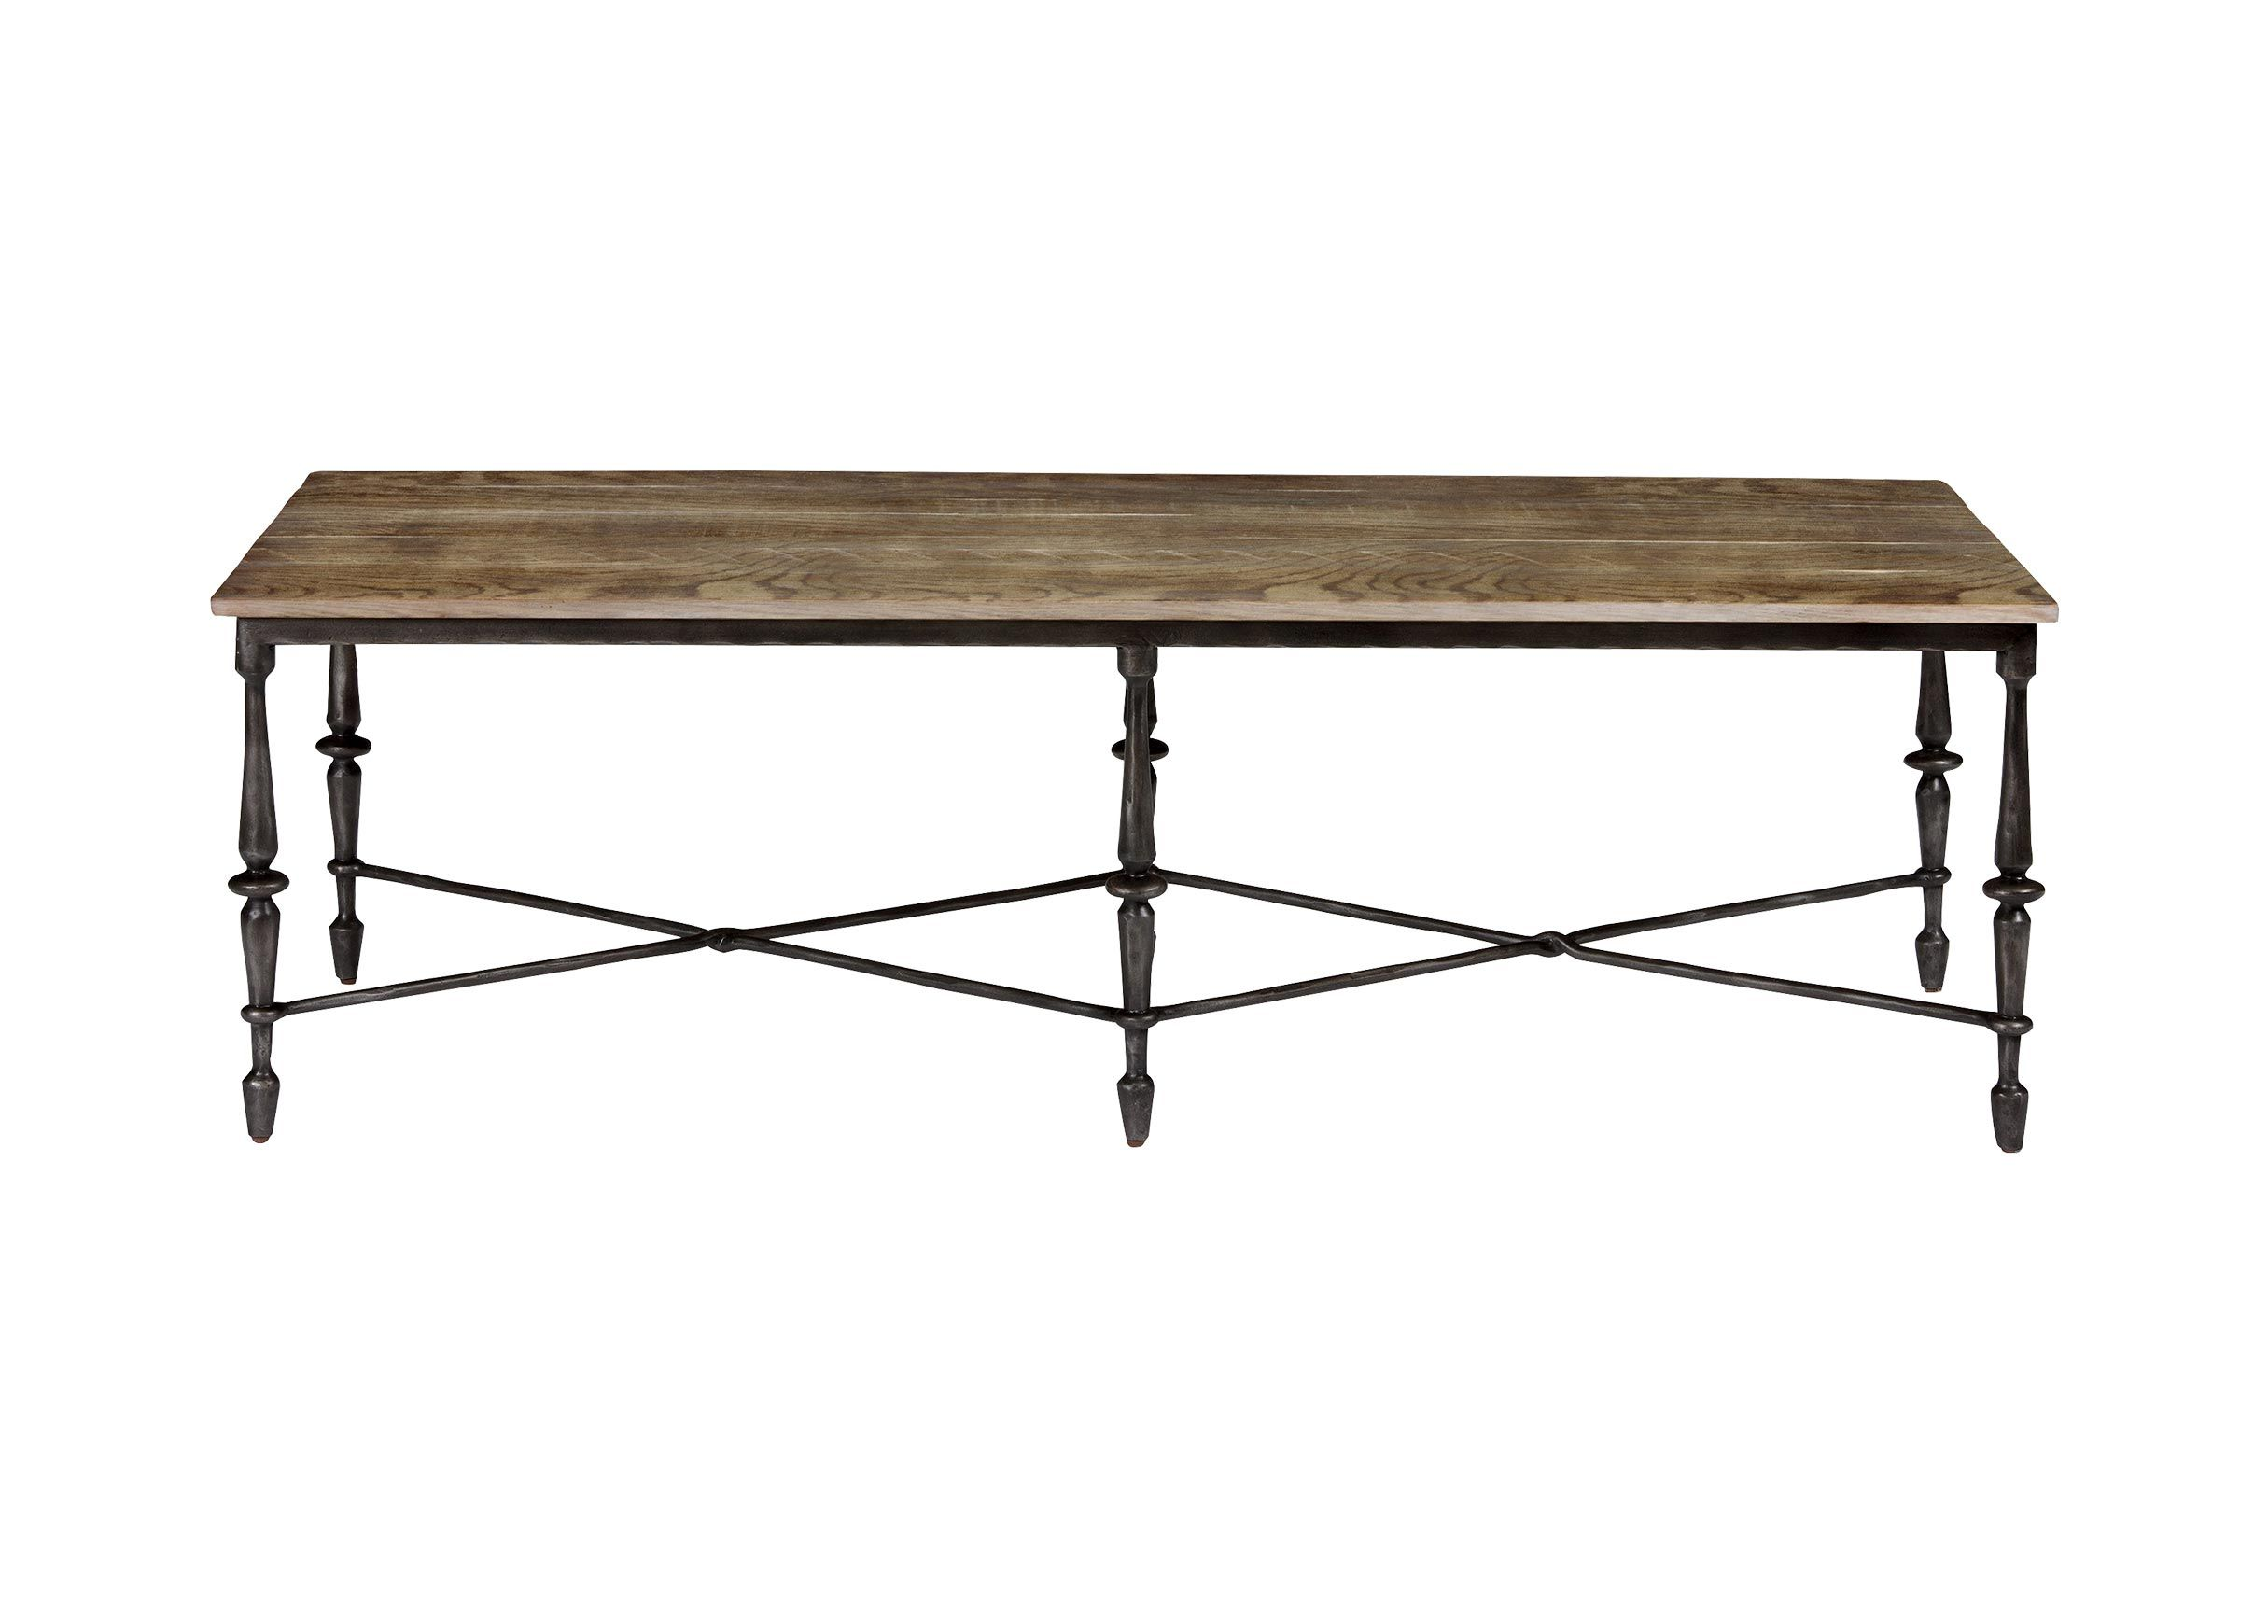 Albee Coffee Table Tables Ethan Allen